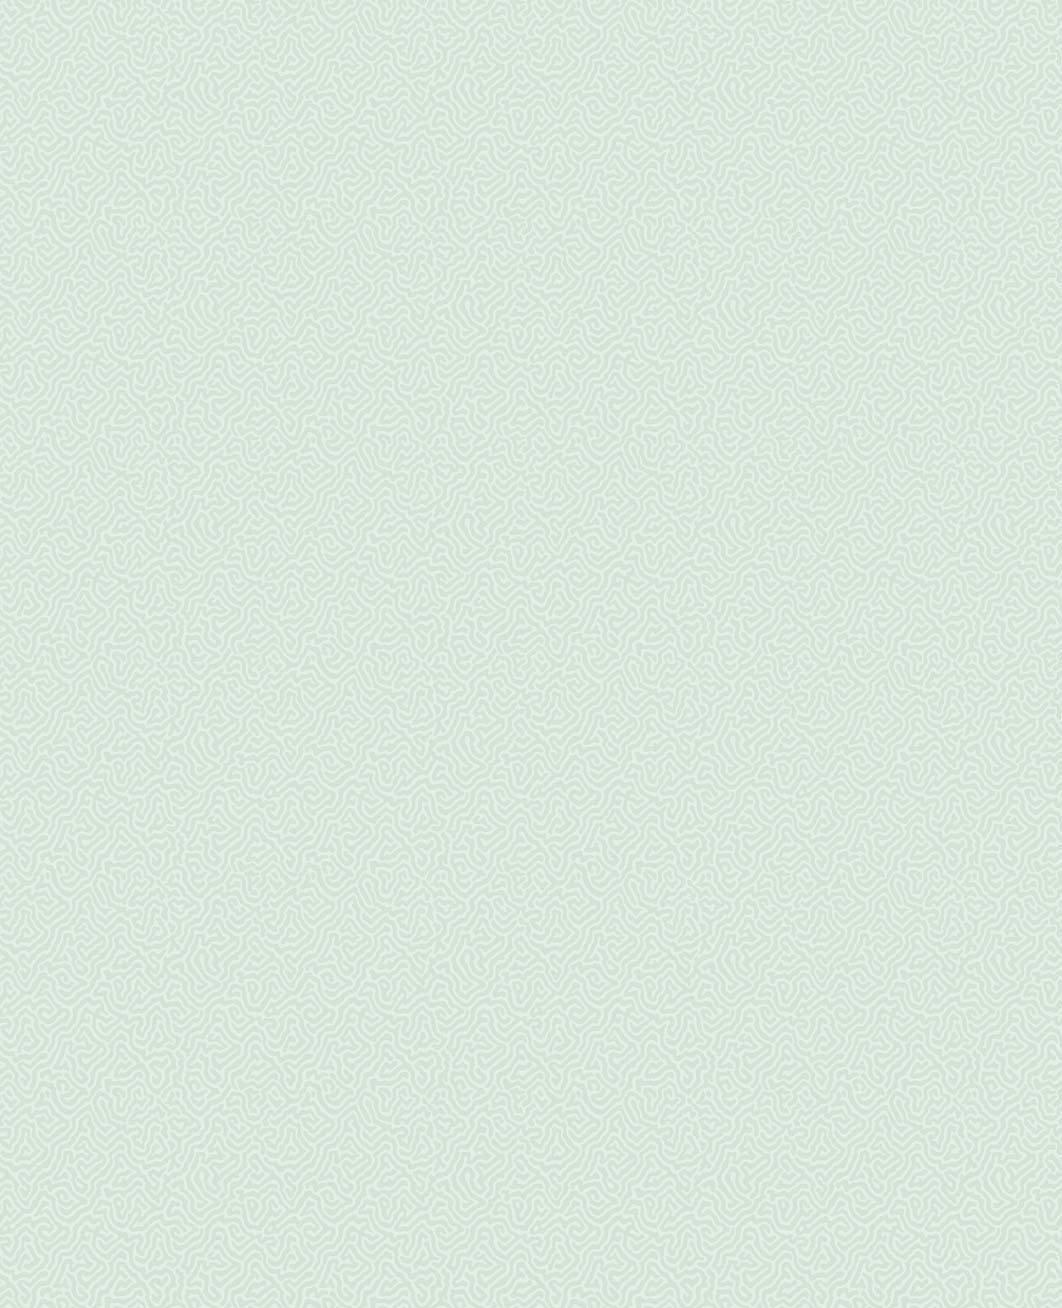 Обои Cole & Son Landscape Plains 106/5065, интернет магазин Волео